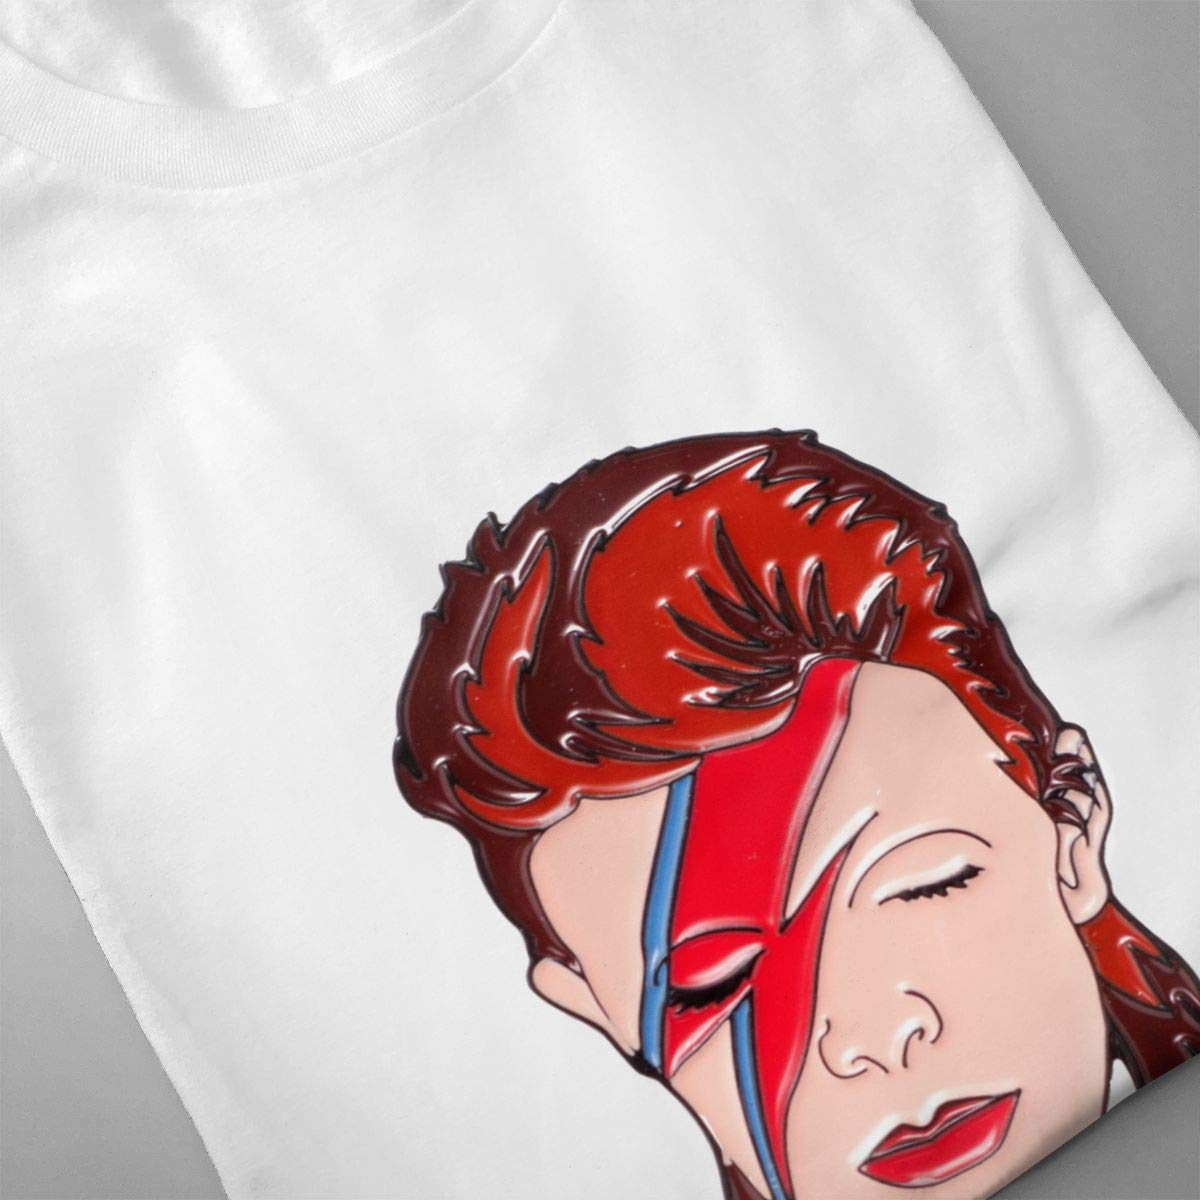 QINSHAONI David-Bowie Teenagers Boy Retro Trend Printed Letters 3D Pattern Comfortable Light T-Shirt T-Shirts M